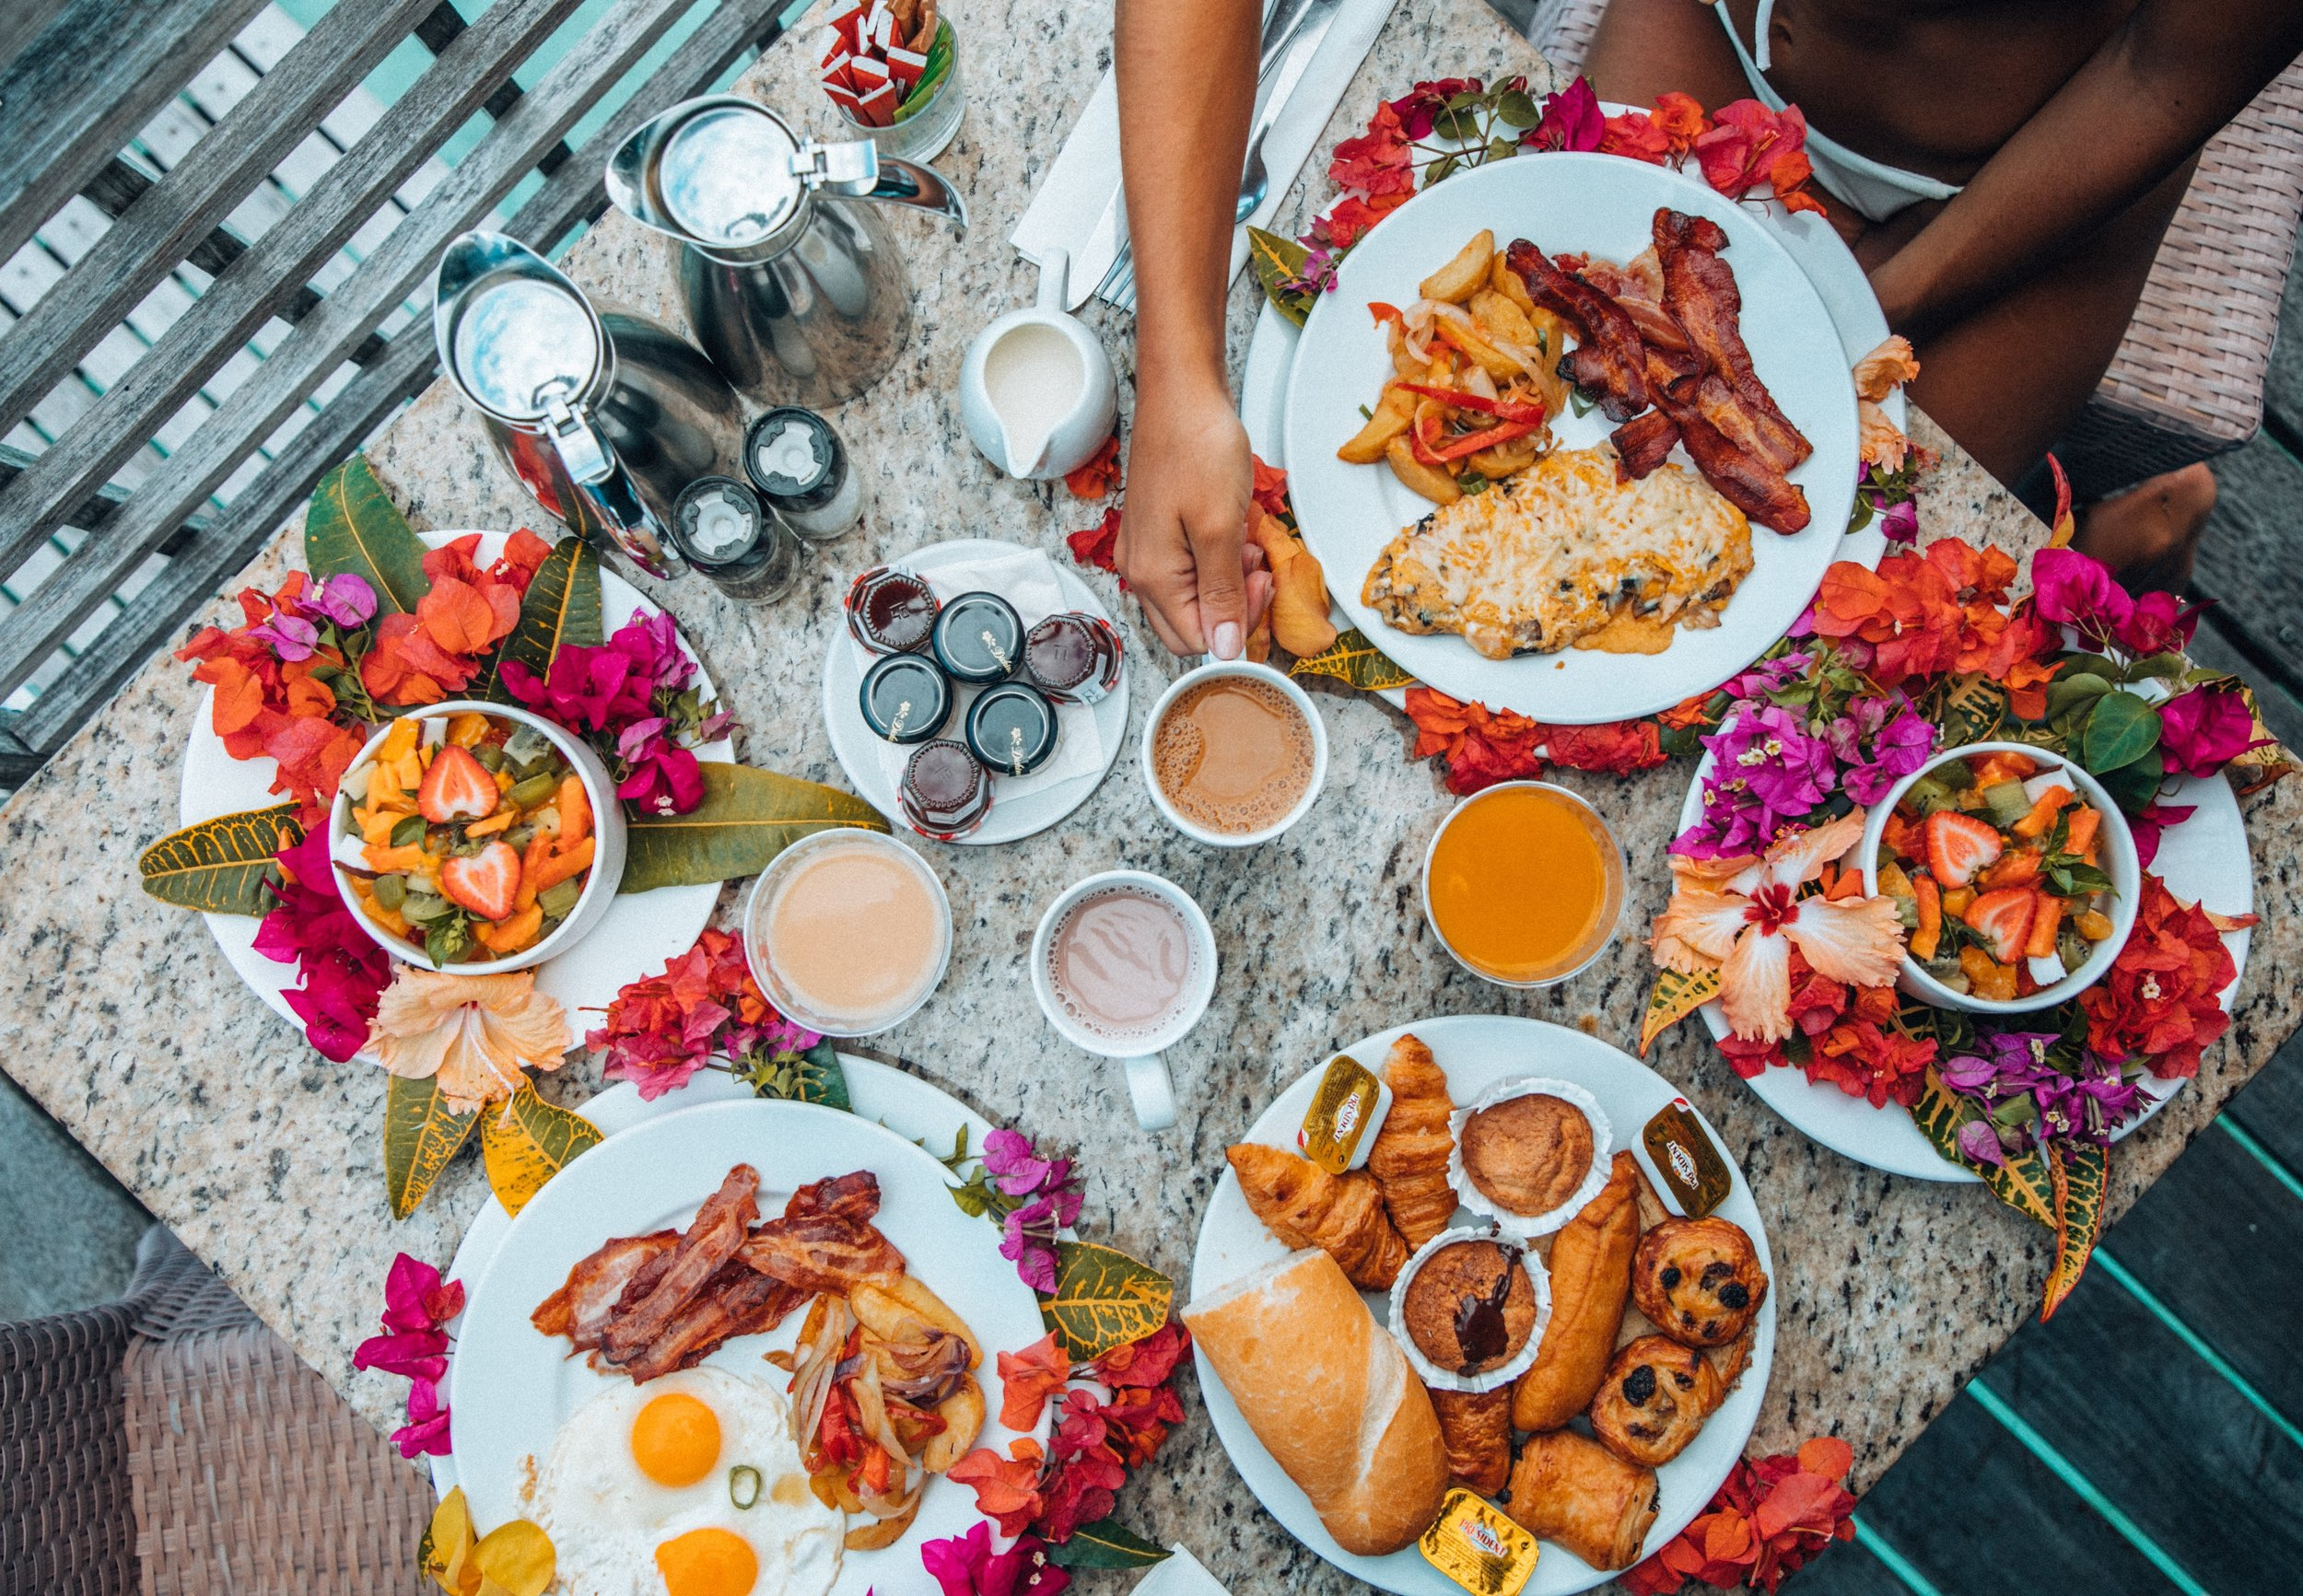 A traditional Polynesian breakfast